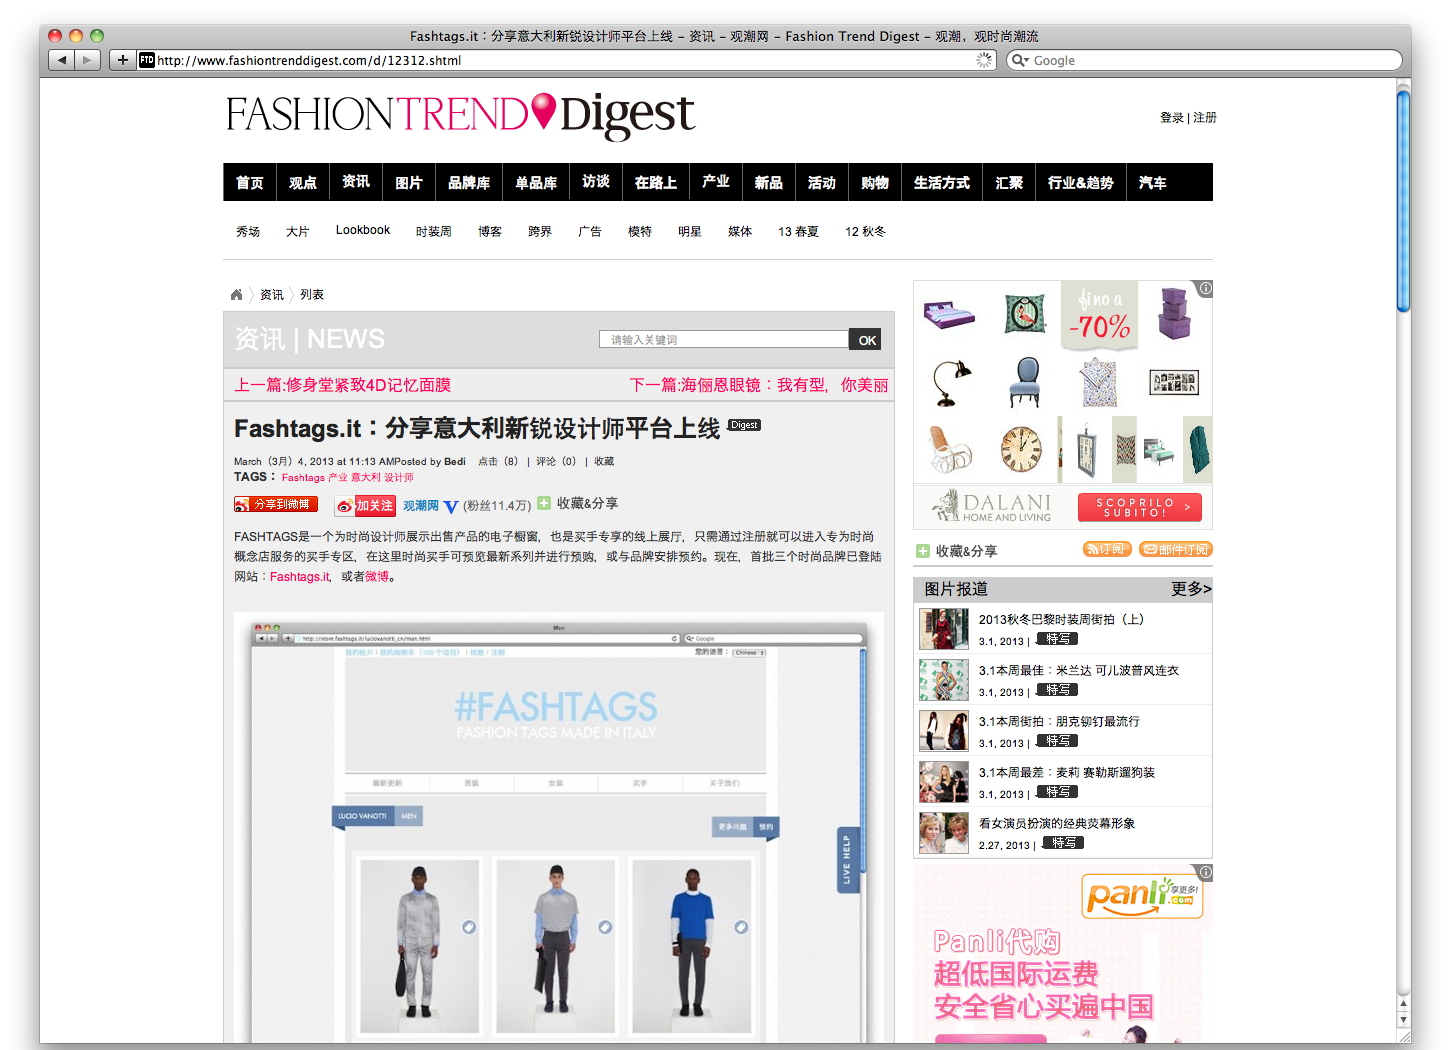 Fashion Trend Digest